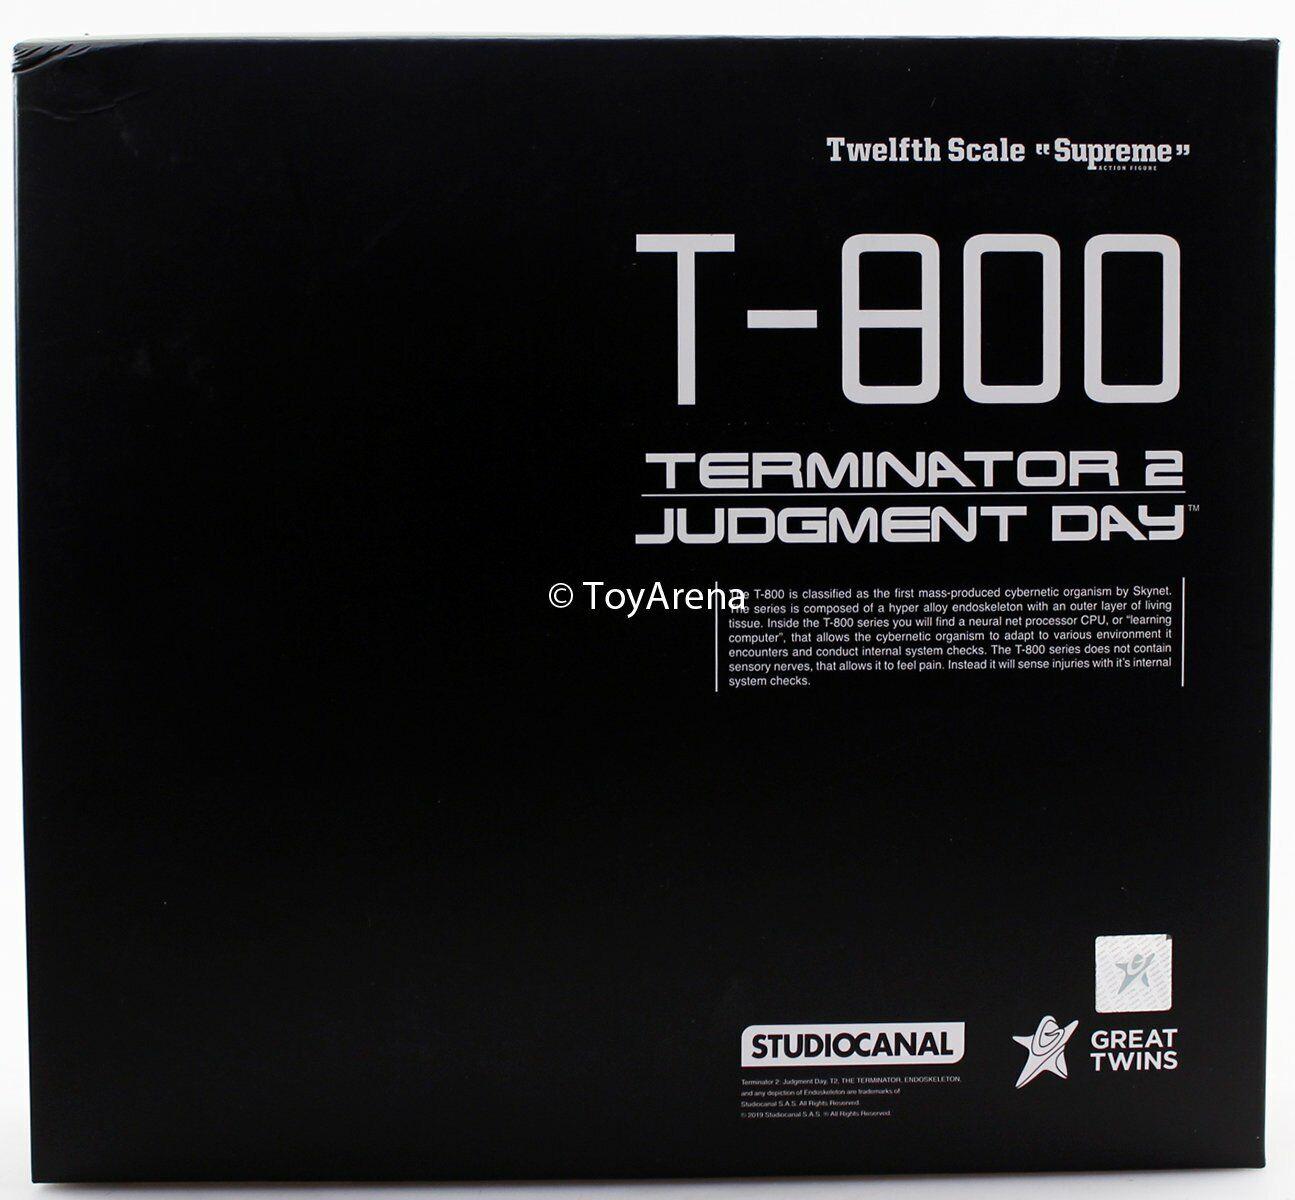 Great Twins 1 12 T-800 Terminator 2 JudgeSiet Day Action Figure USA SELLER